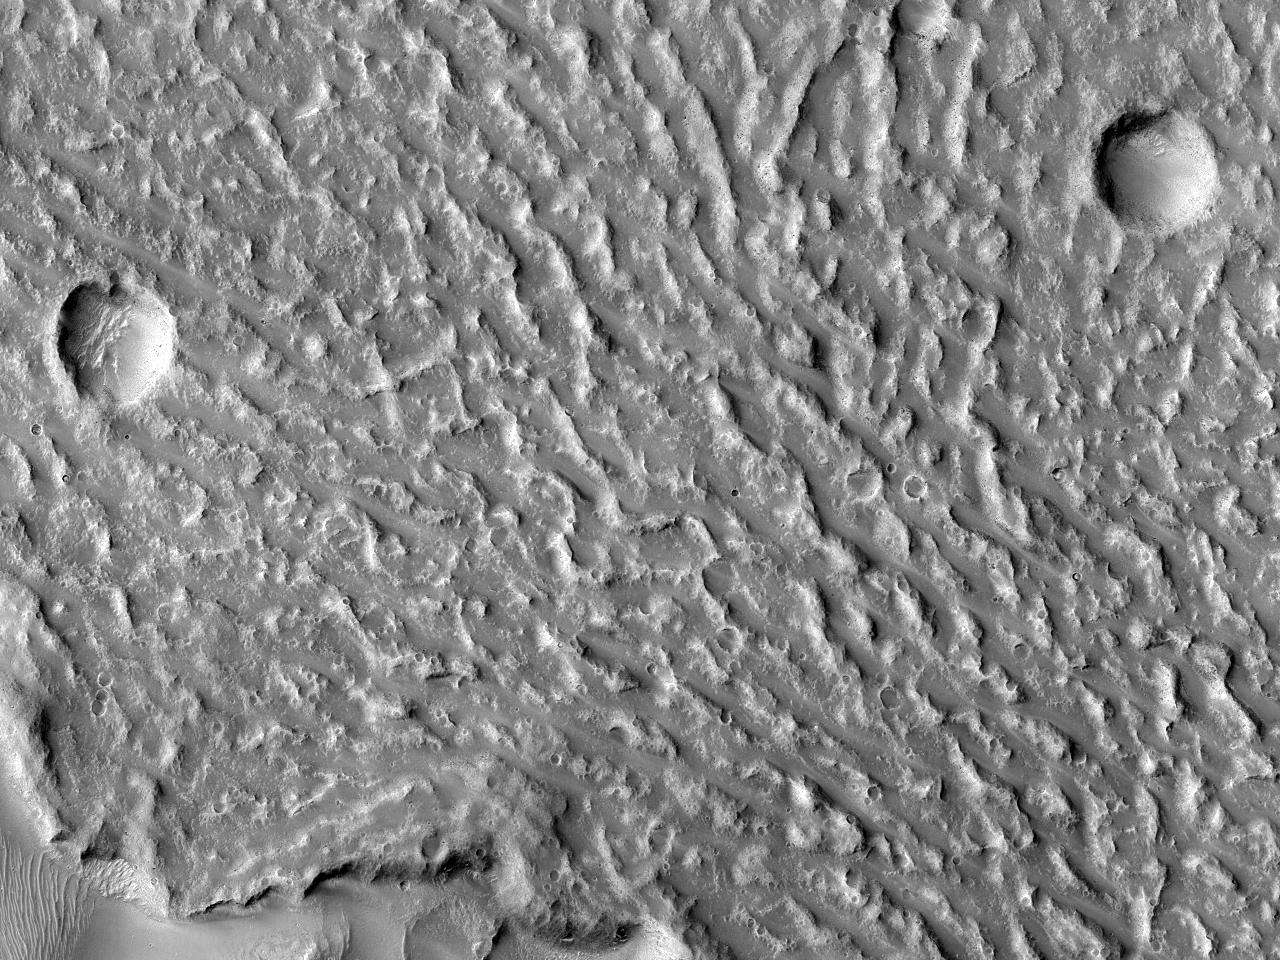 Поток лавы на плато Daedalia Planum